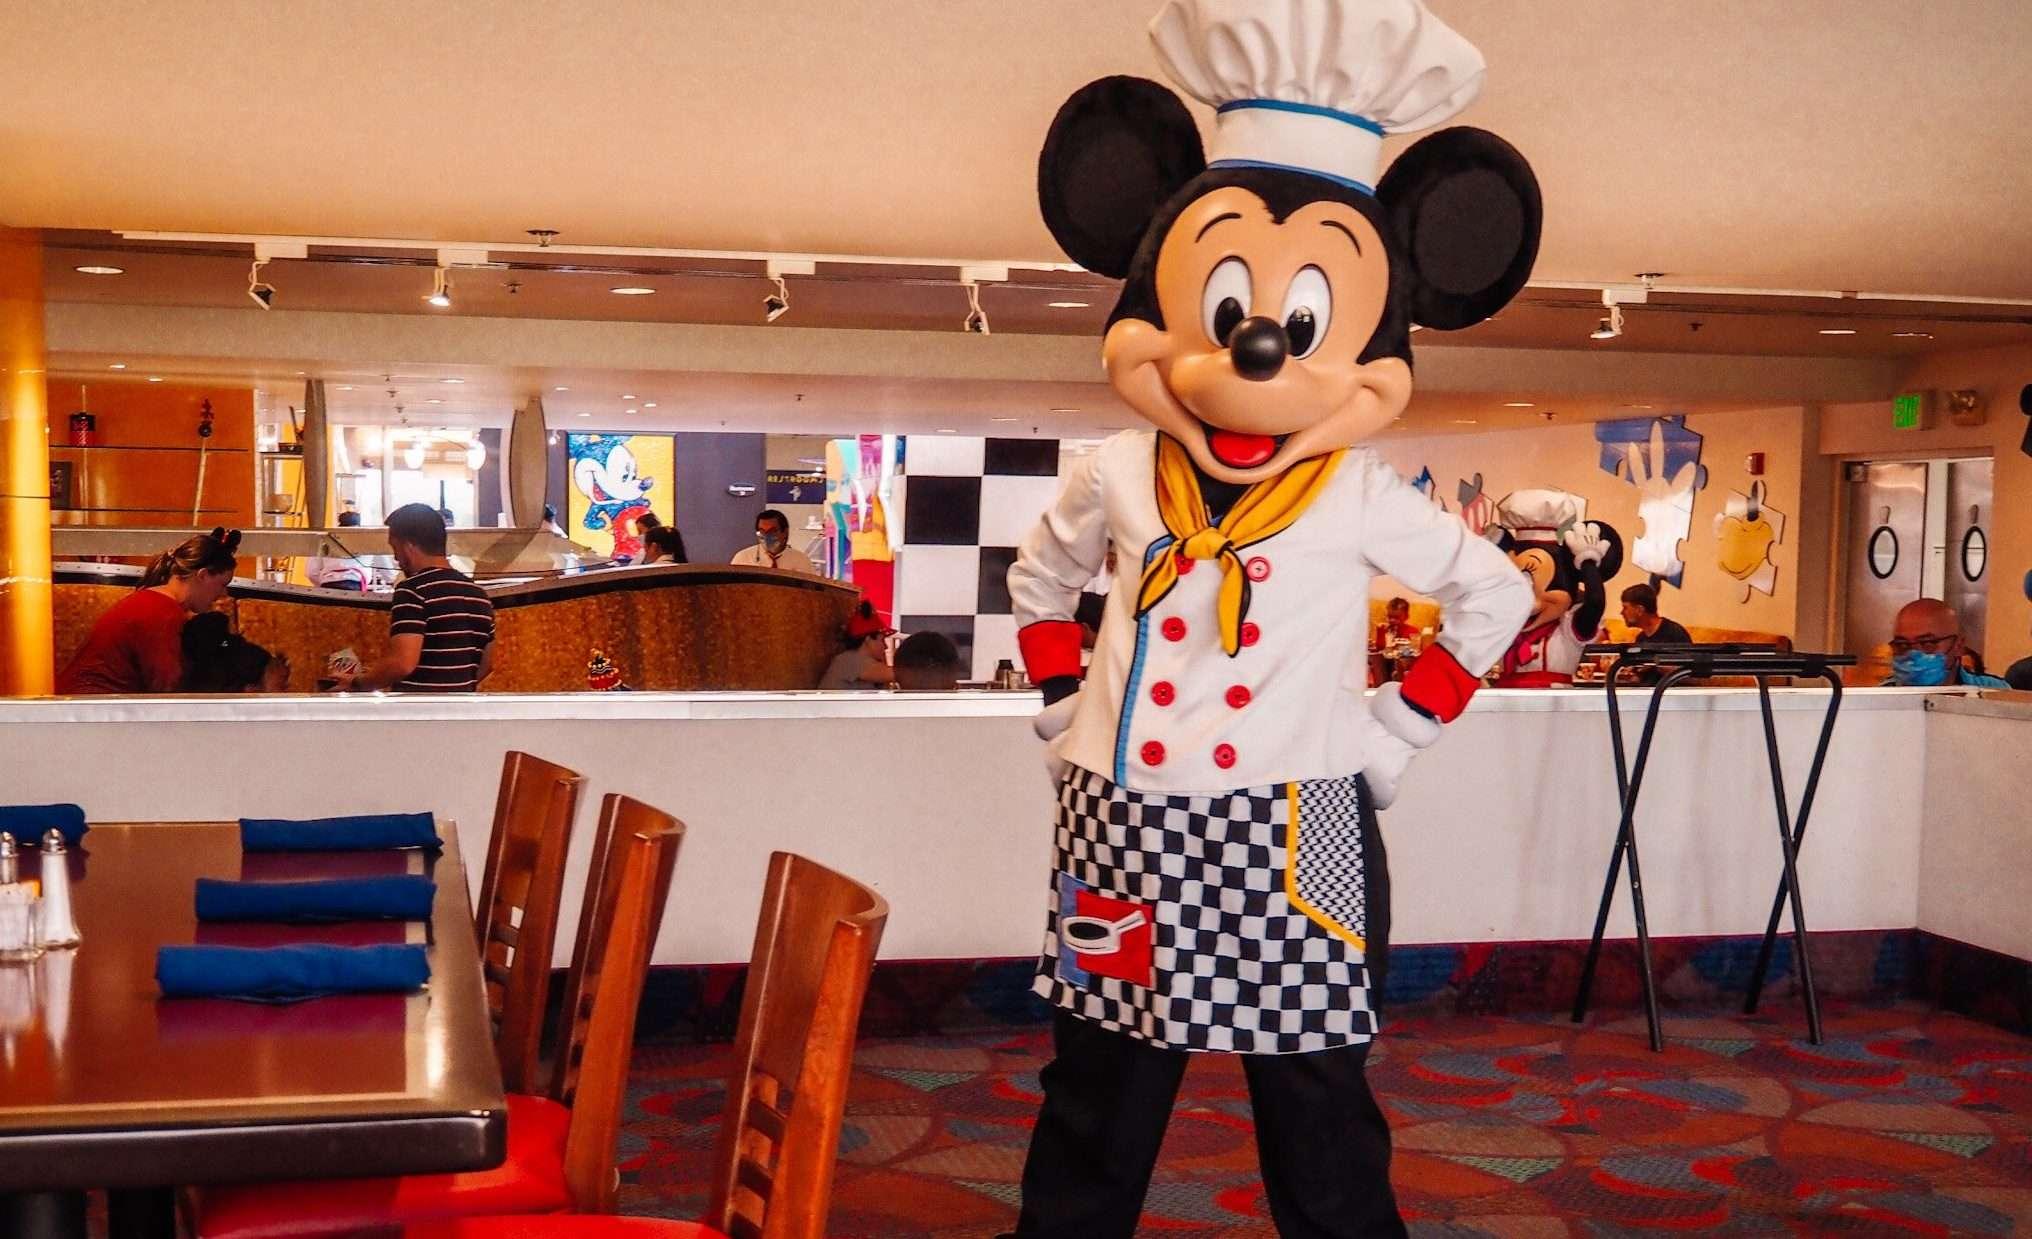 Chef Mickey's Breakfast at Disney's Contemporary Resort